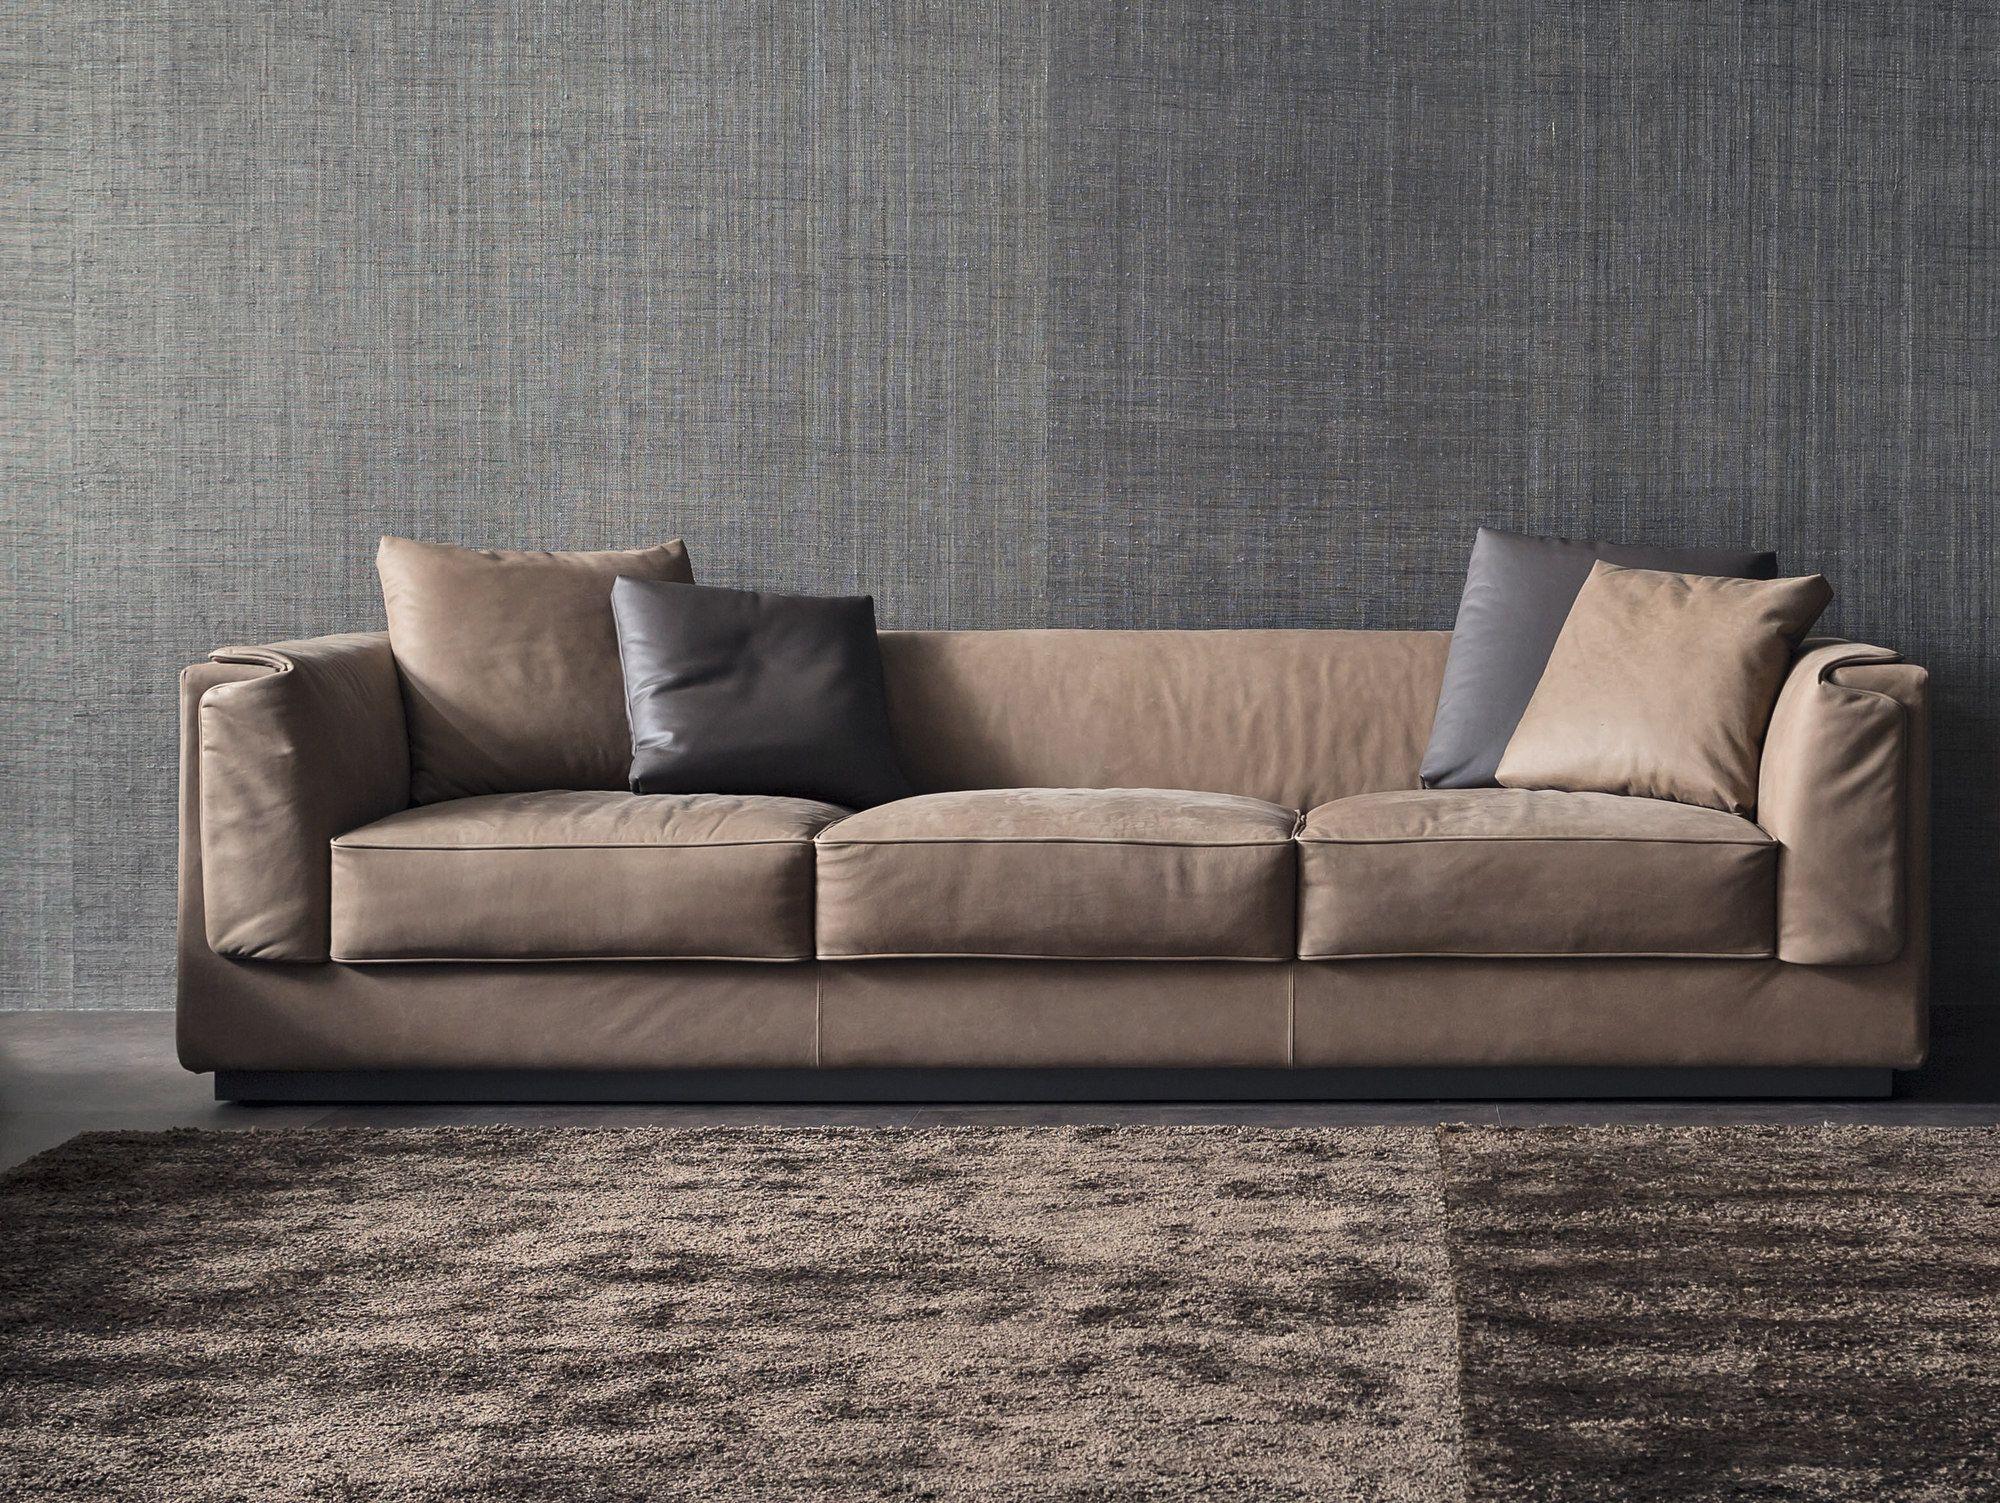 divano imbottito divano a 3 posti collezione gentleman by flou rh pinterest com au